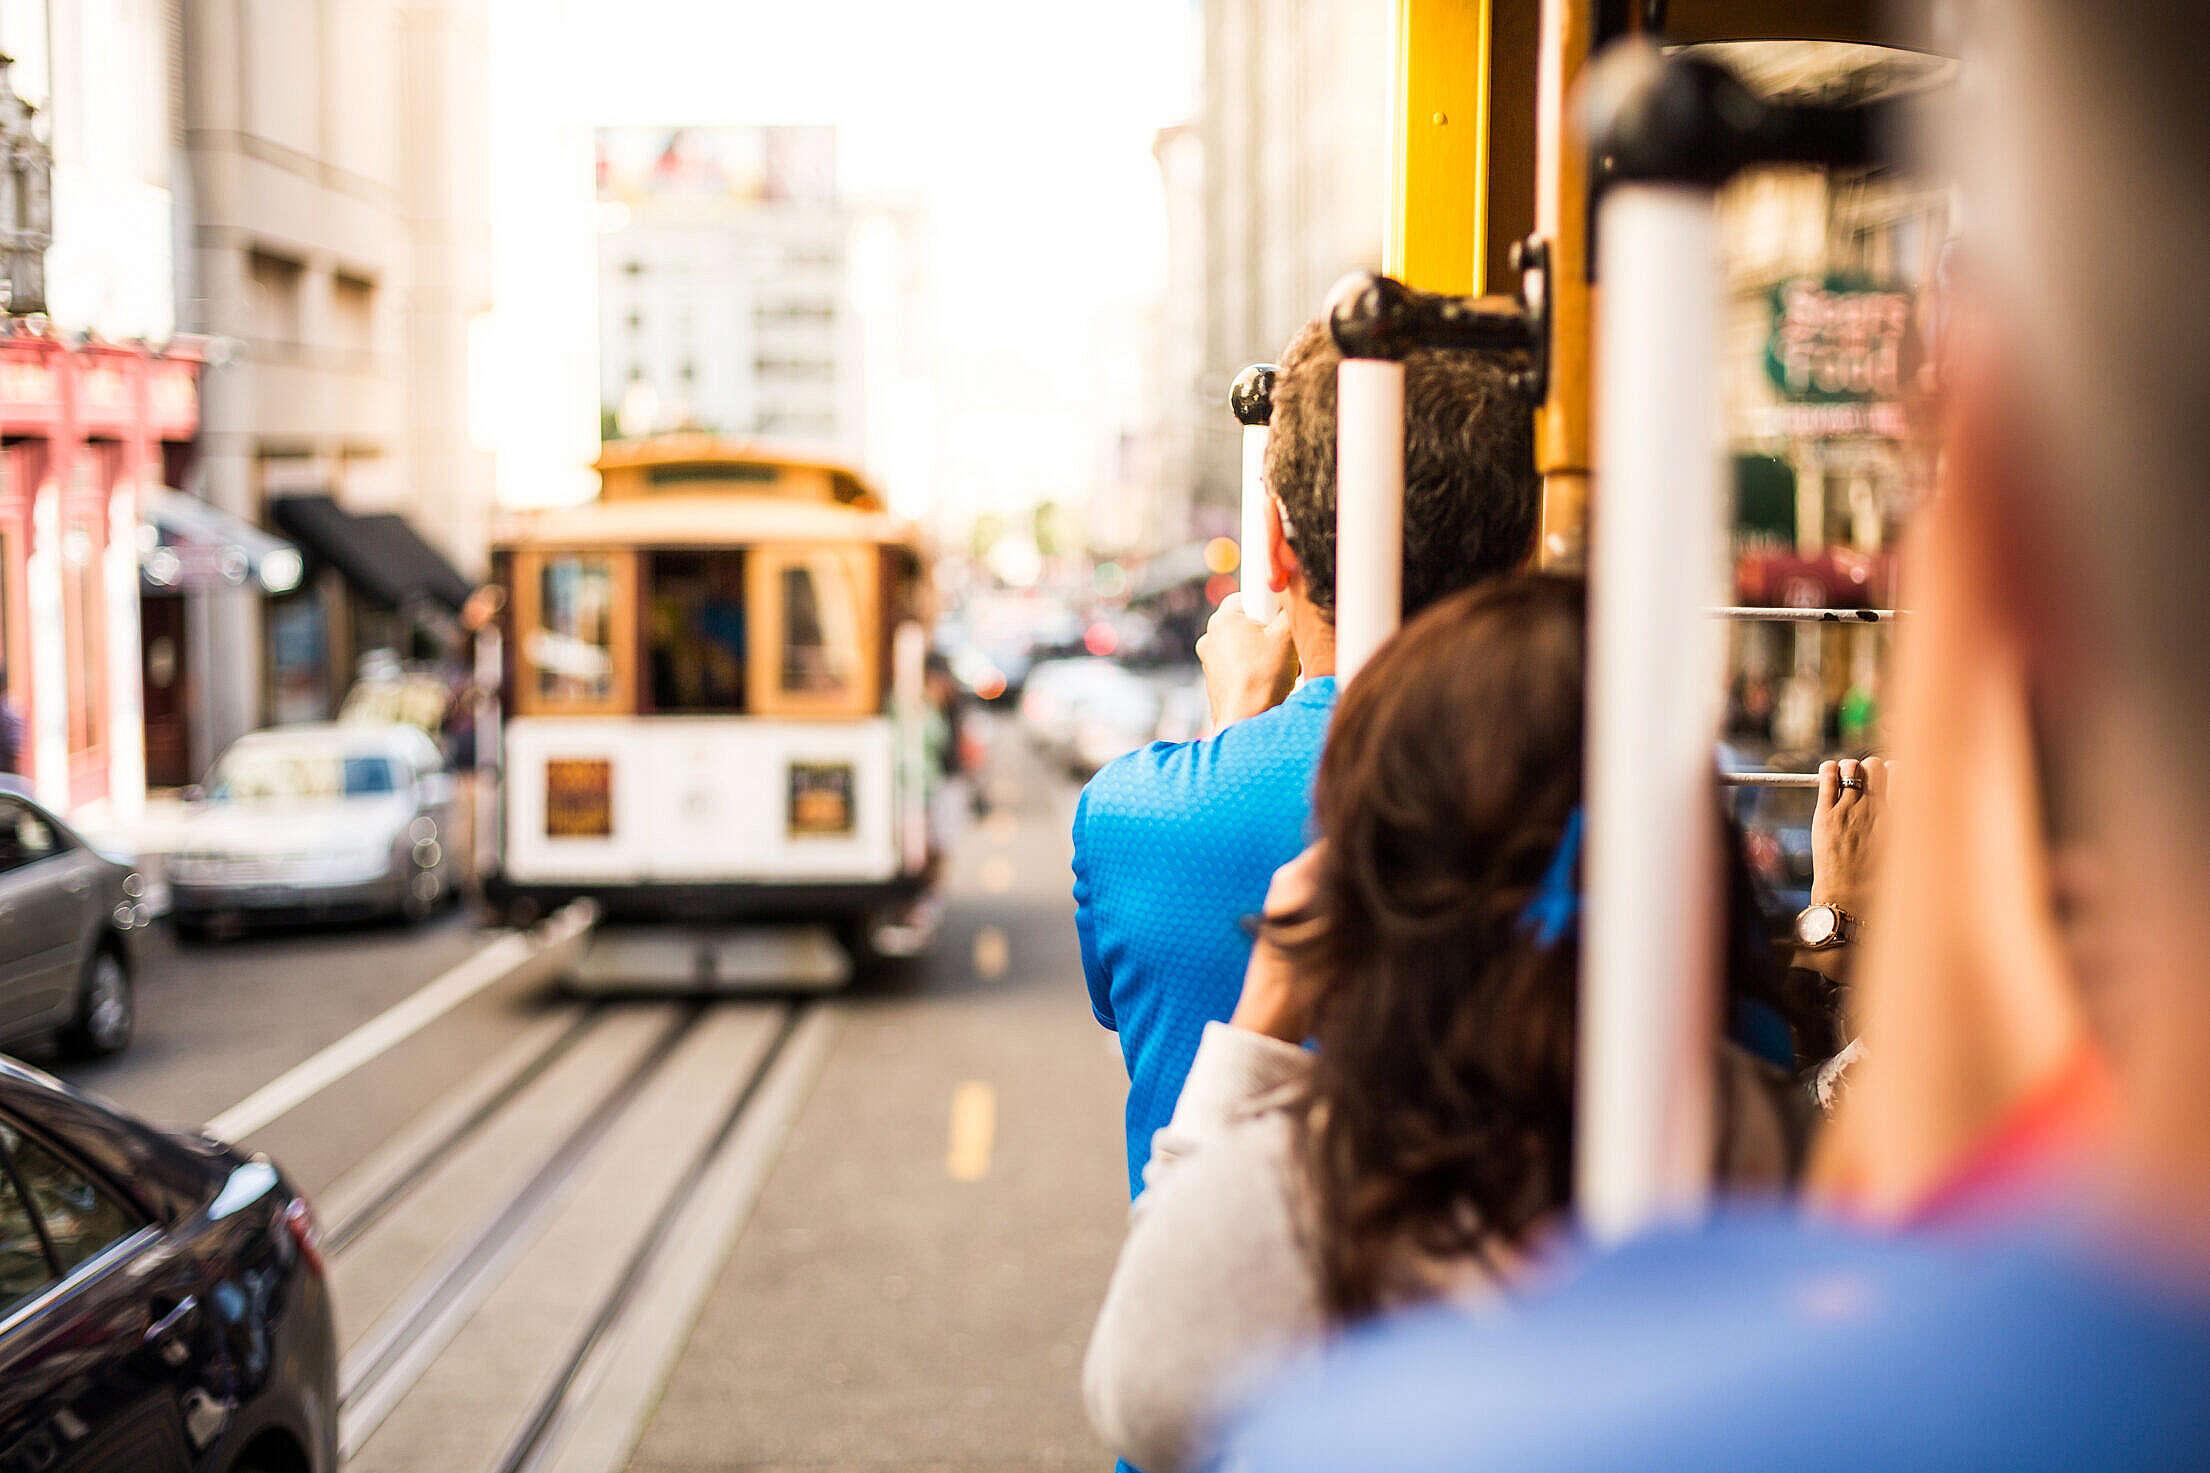 San Francisco Cable Car Ride Free Stock Photo